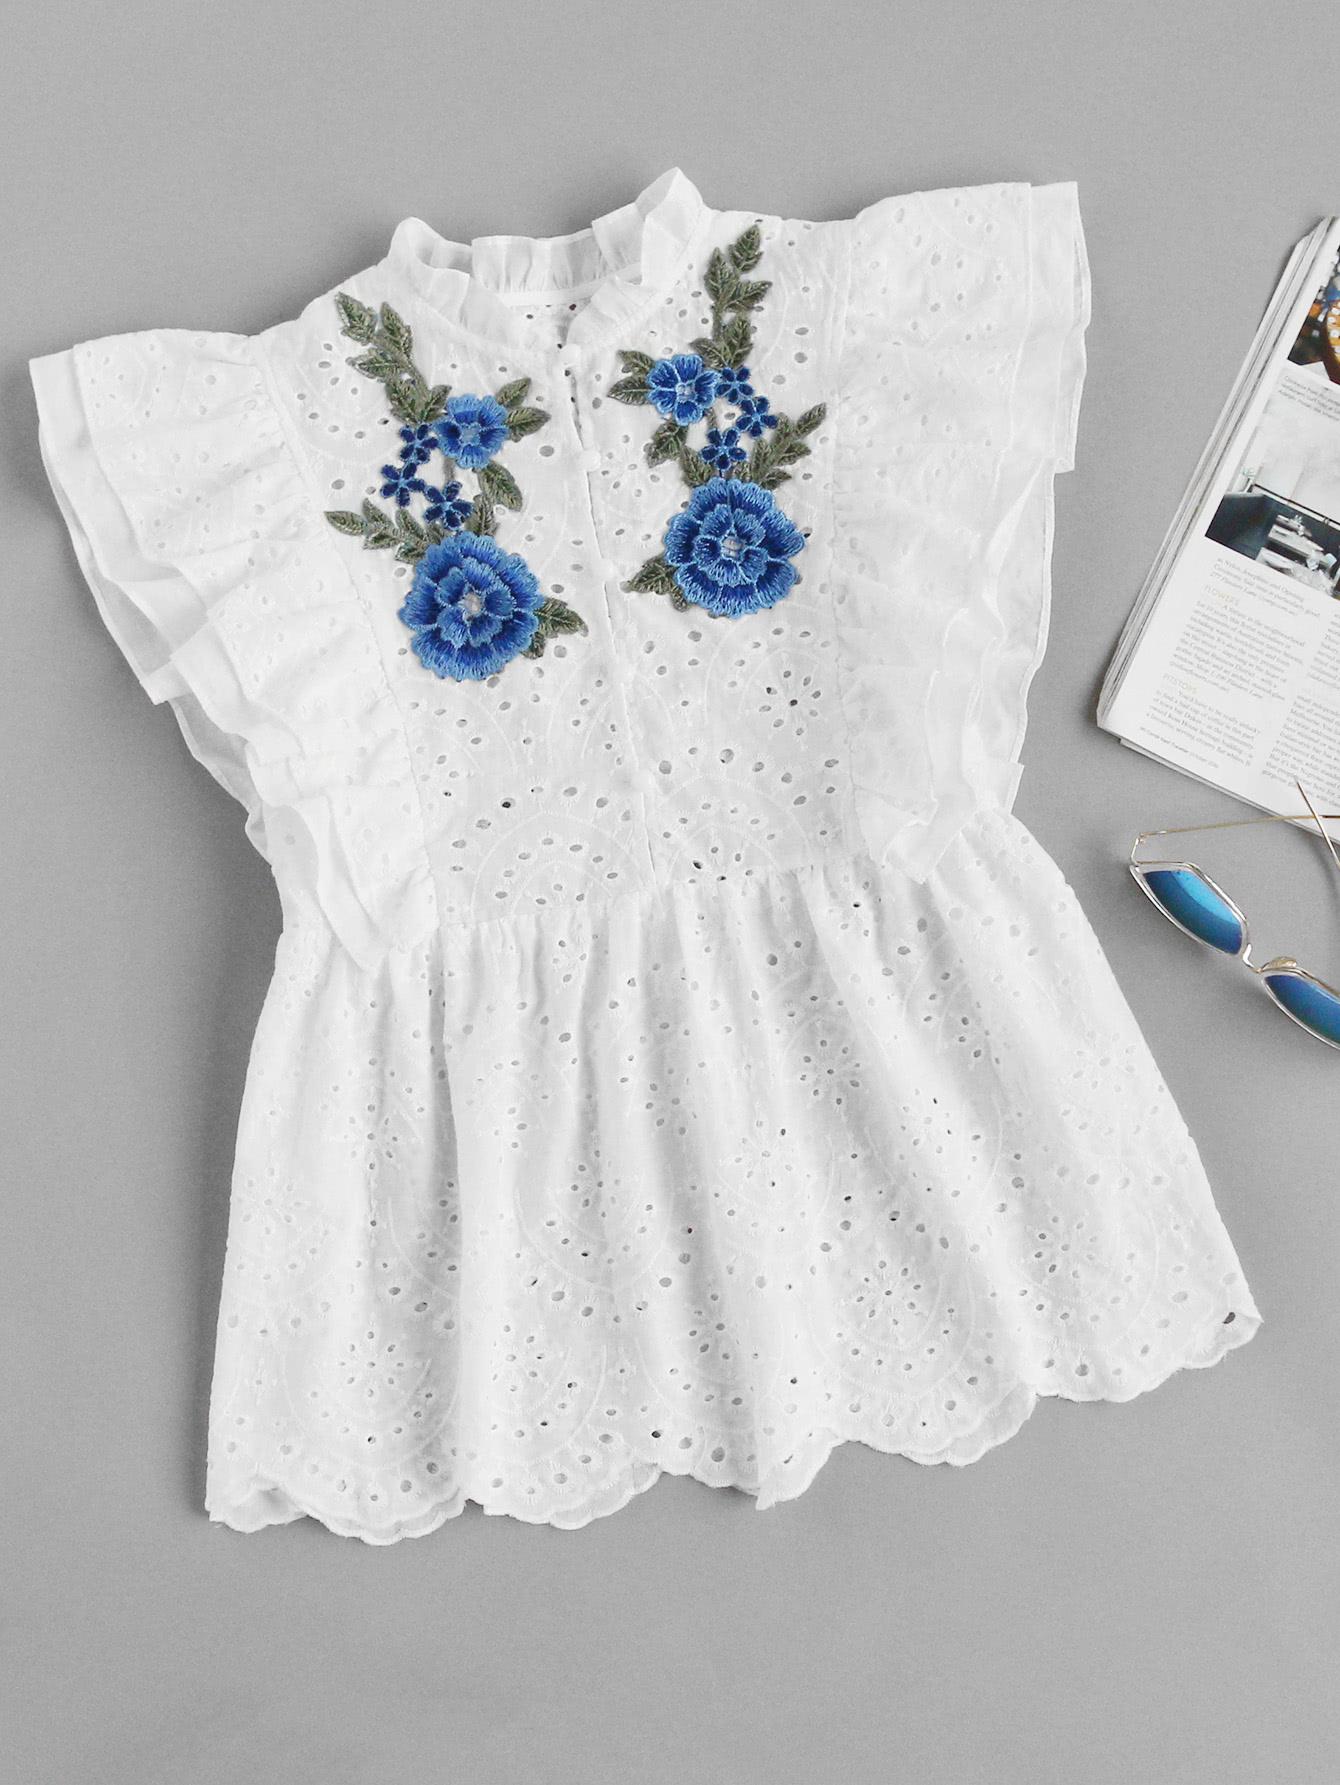 Flower Applique Layered Flutter Sleeve Eyelet Embroidered Top embroidered flutter sleeve self belt romper